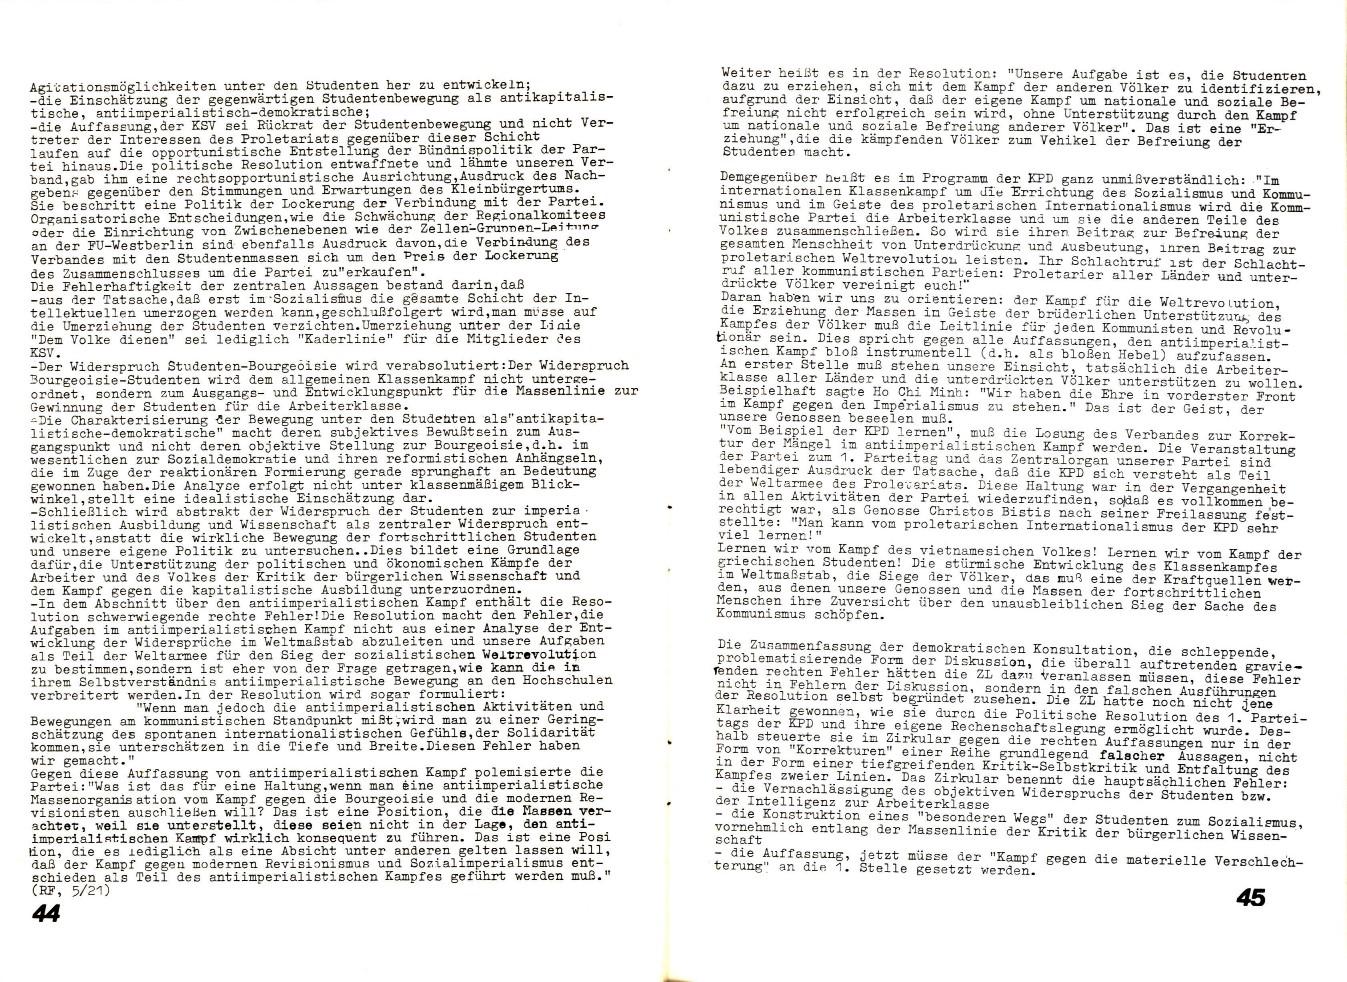 KSV_1974_Rechenschaftsbericht_24